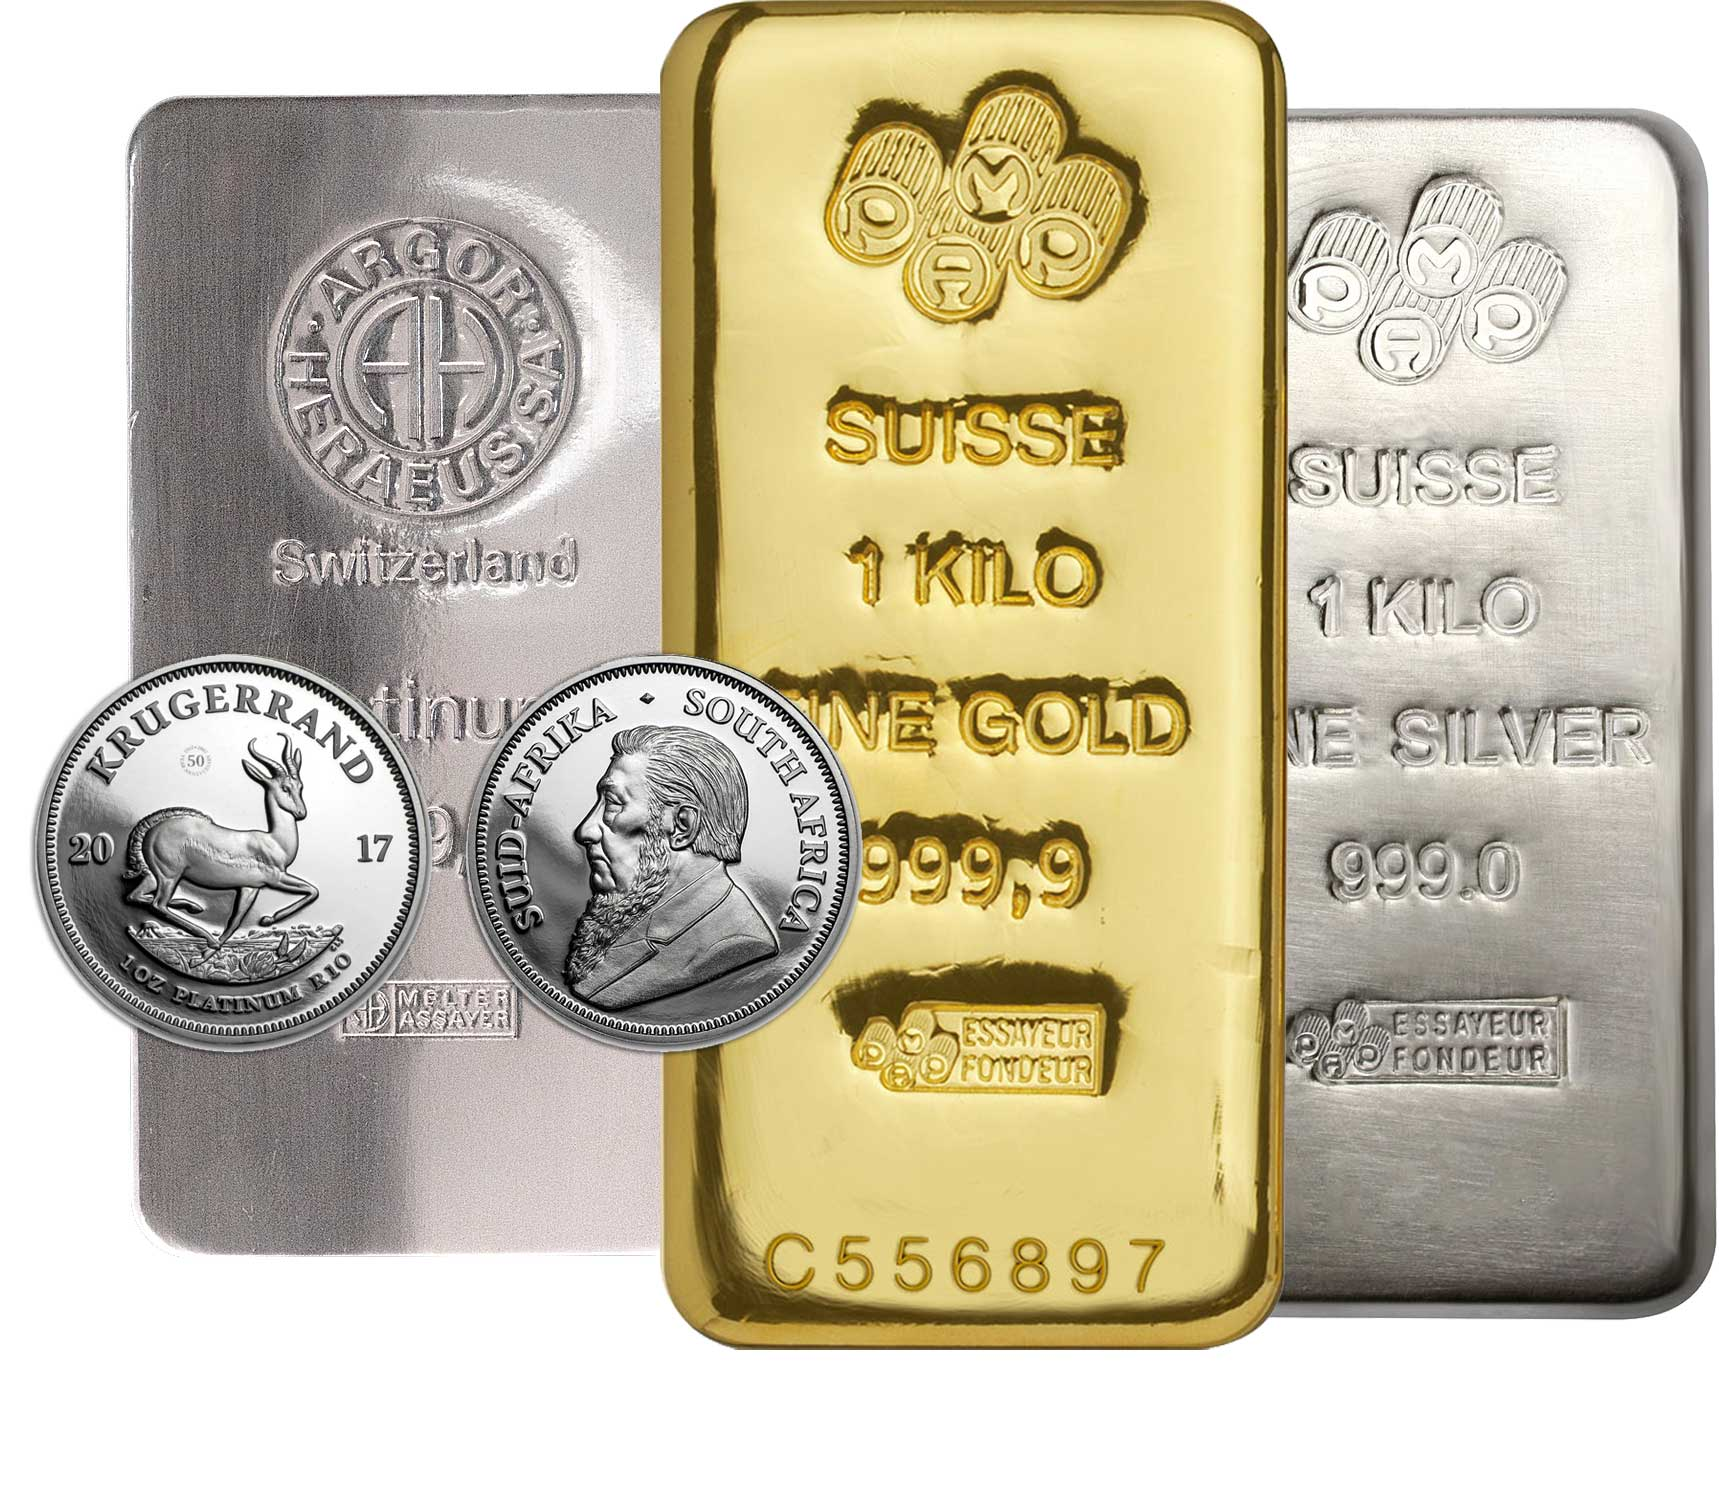 J. Rotbart & Co. Your Precious Metals Experts